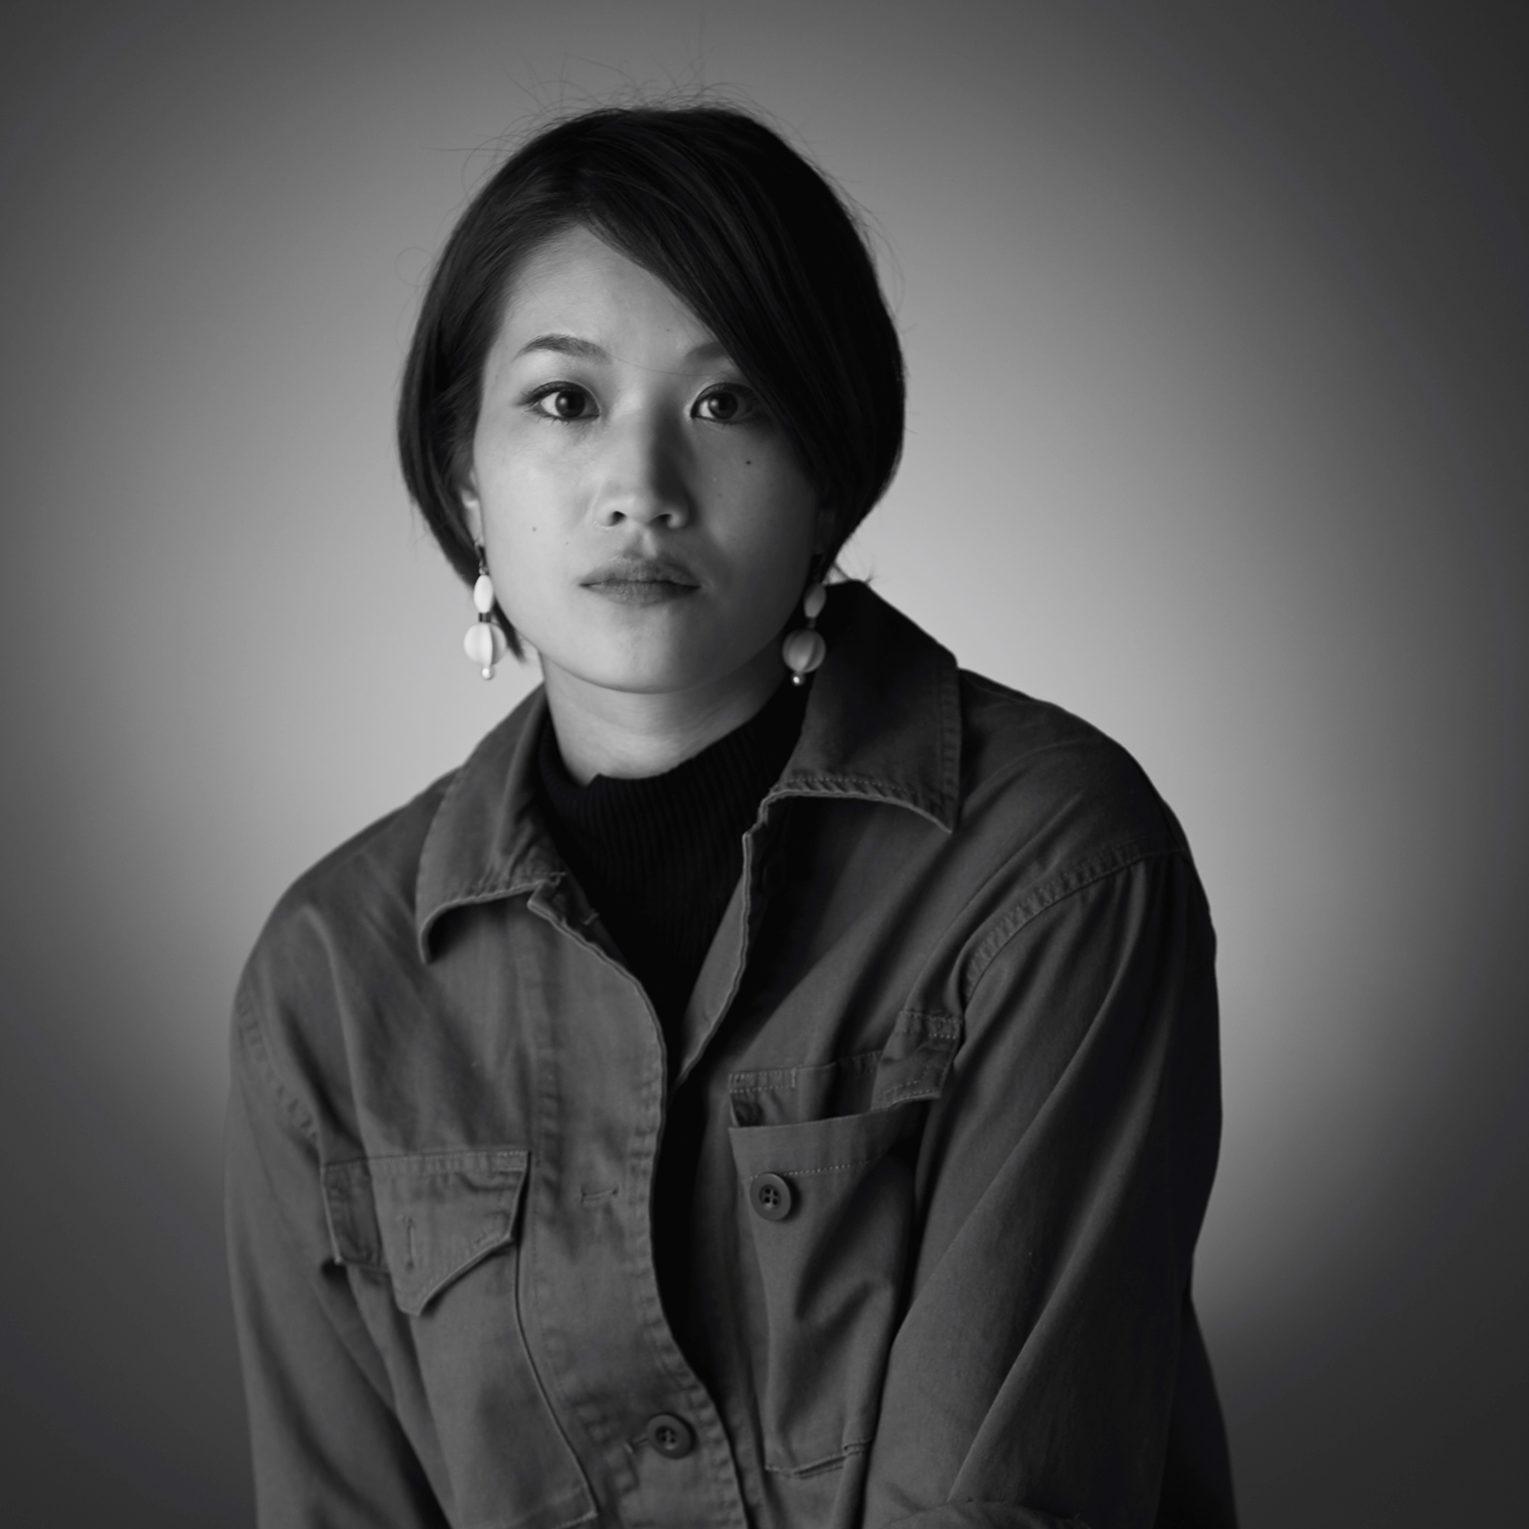 葦田礼子(Ashida Reiko)